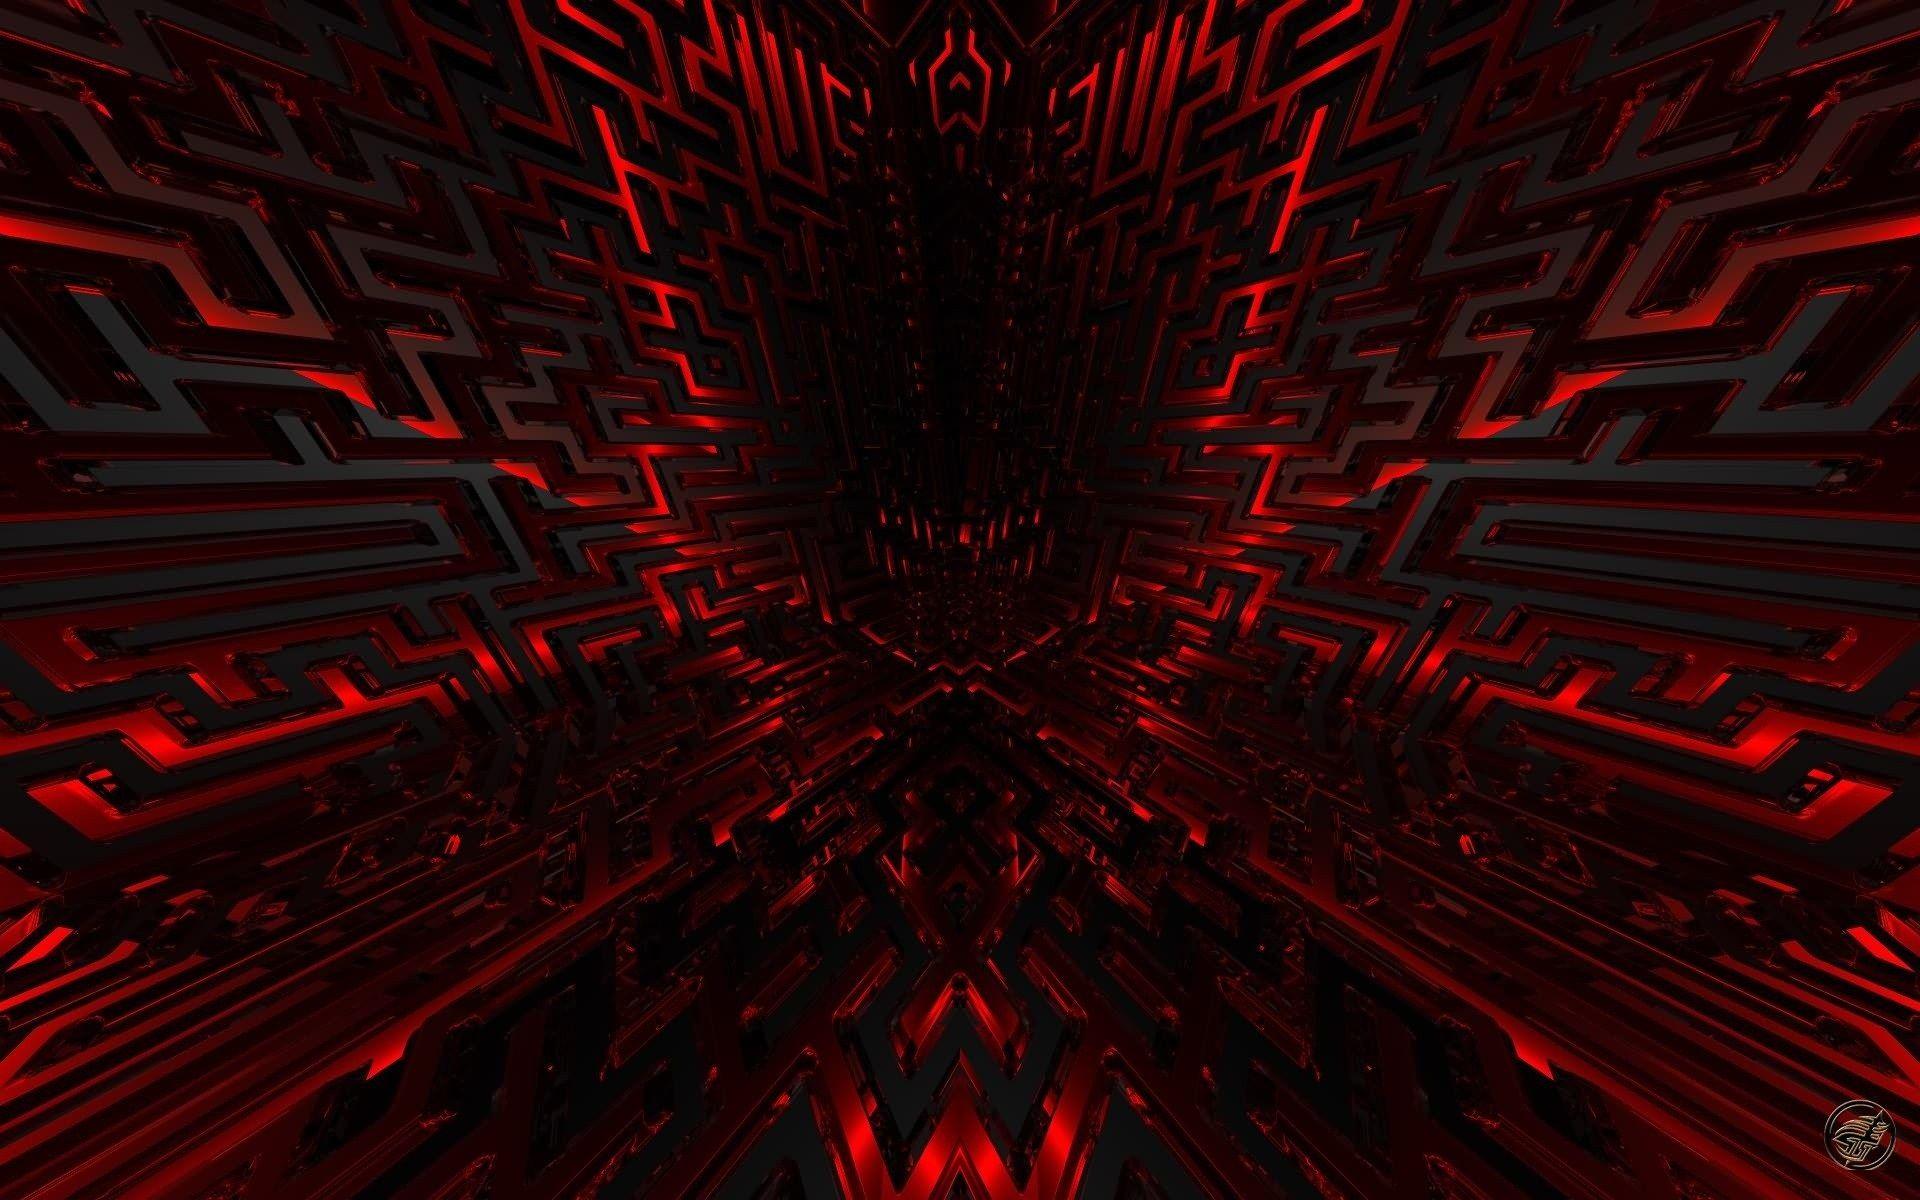 Red Desktop Background Red And Black Wallpaper Red And Black Background Red Wallpaper